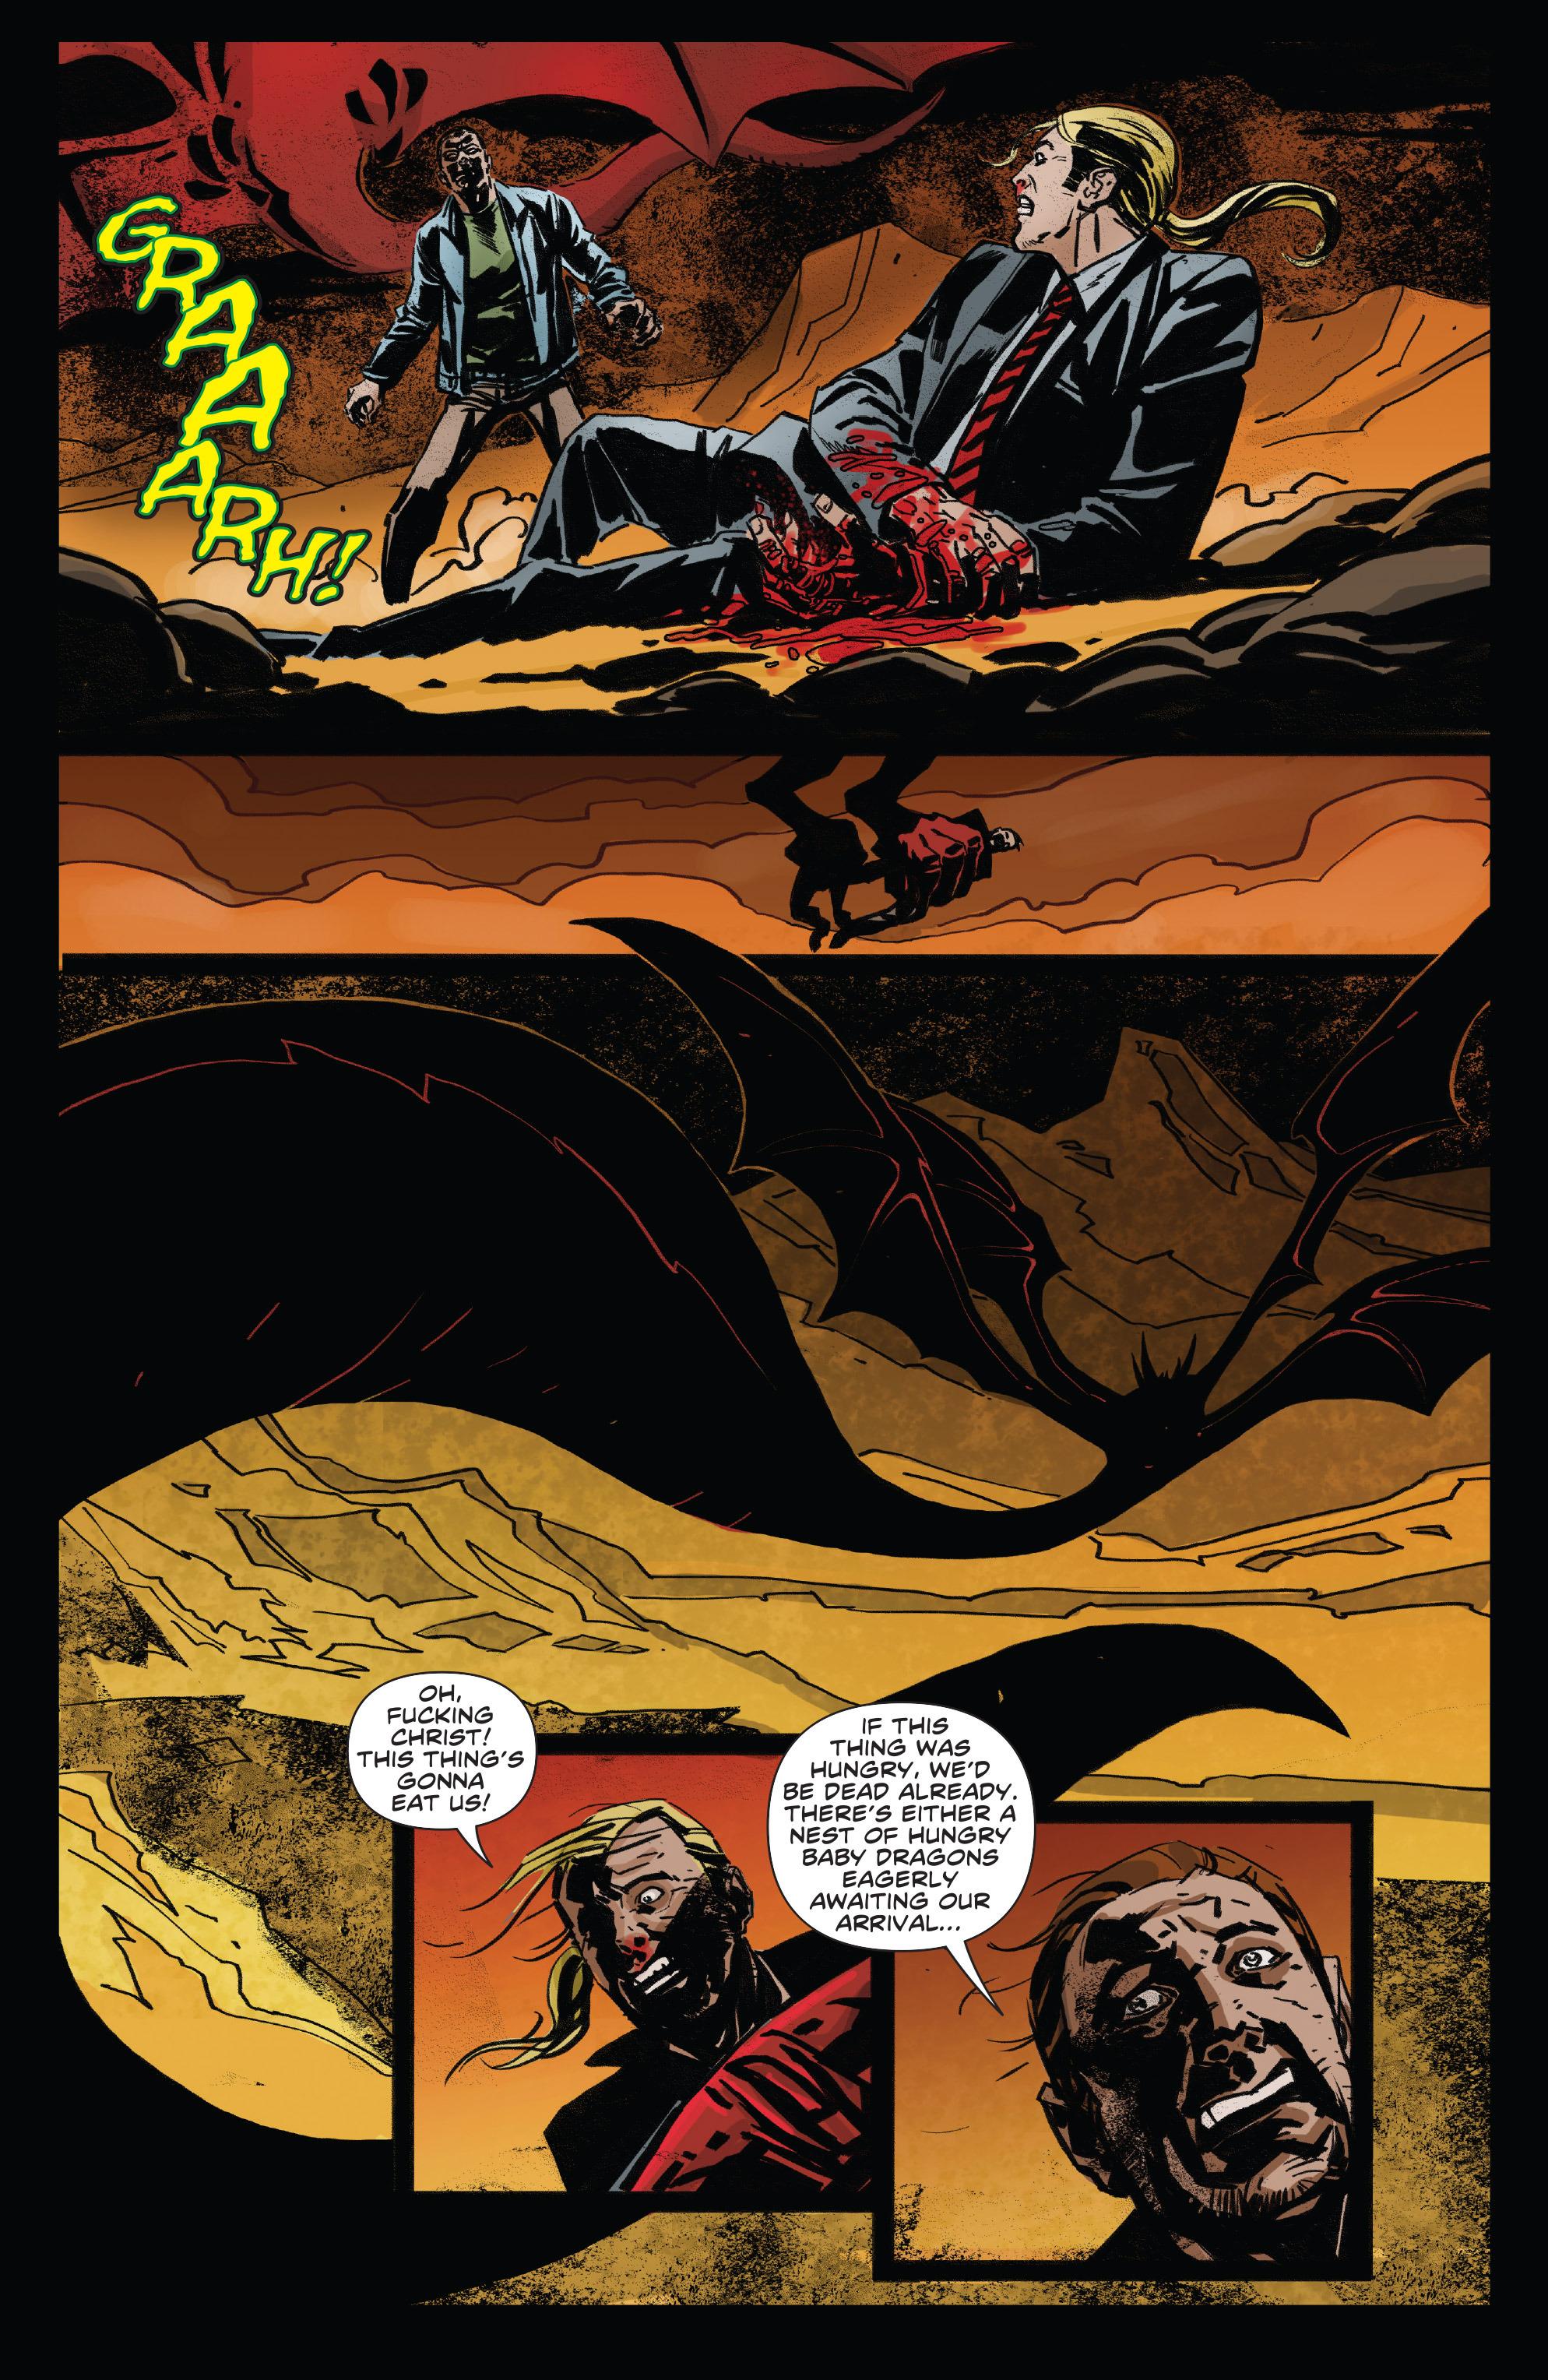 Read online Clive Barker's Hellraiser: The Dark Watch comic -  Issue # TPB 3 - 26